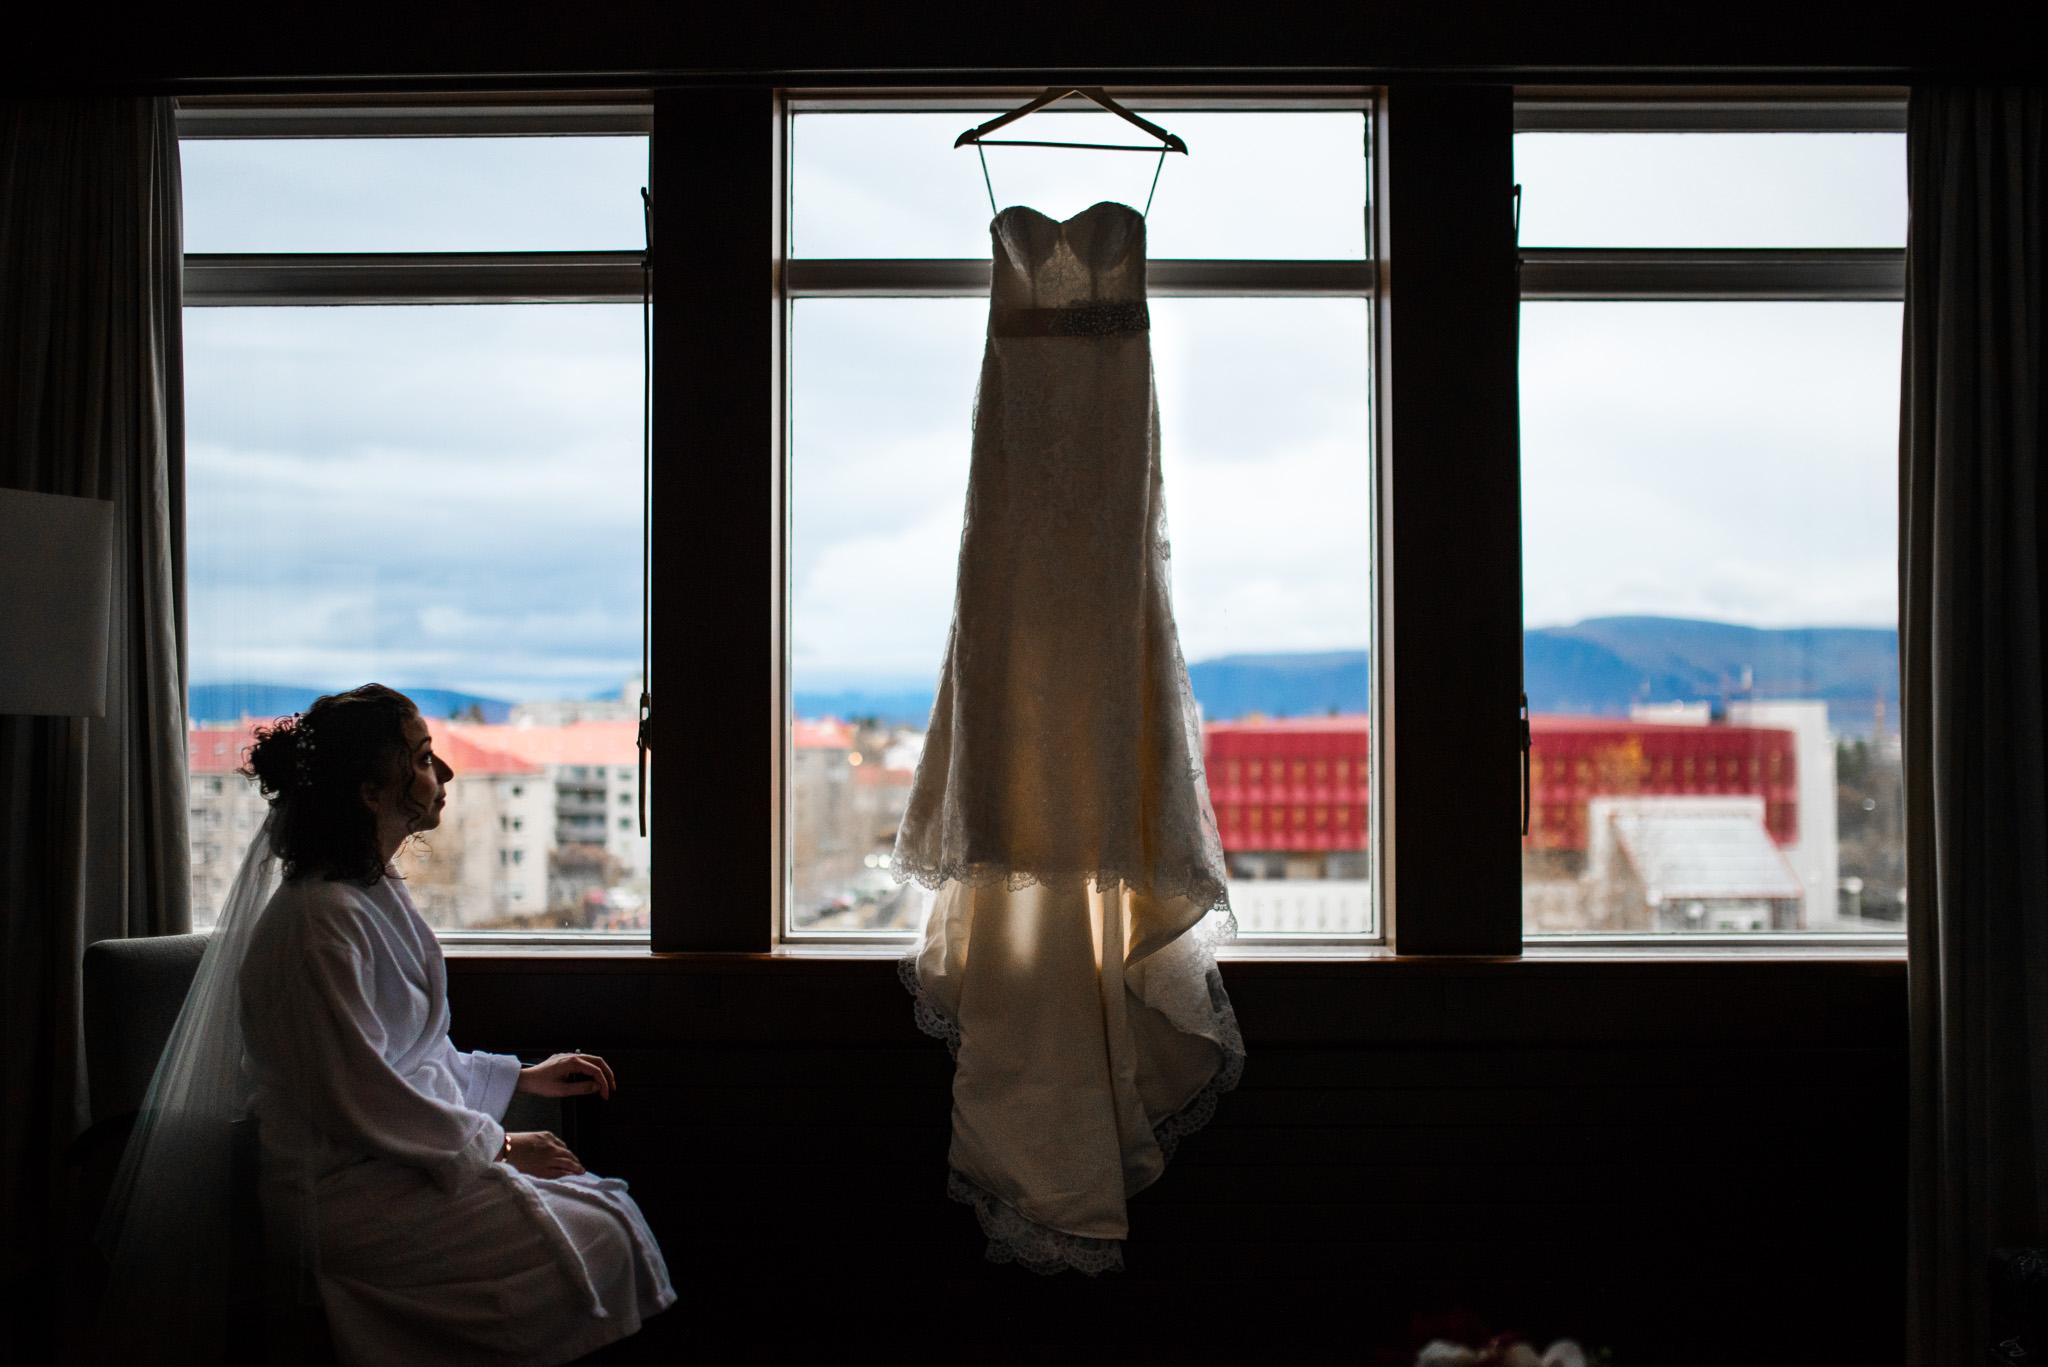 reykjavik-elopement-iceland-reykjanes-victoria-wedding-photographers-9.jpg